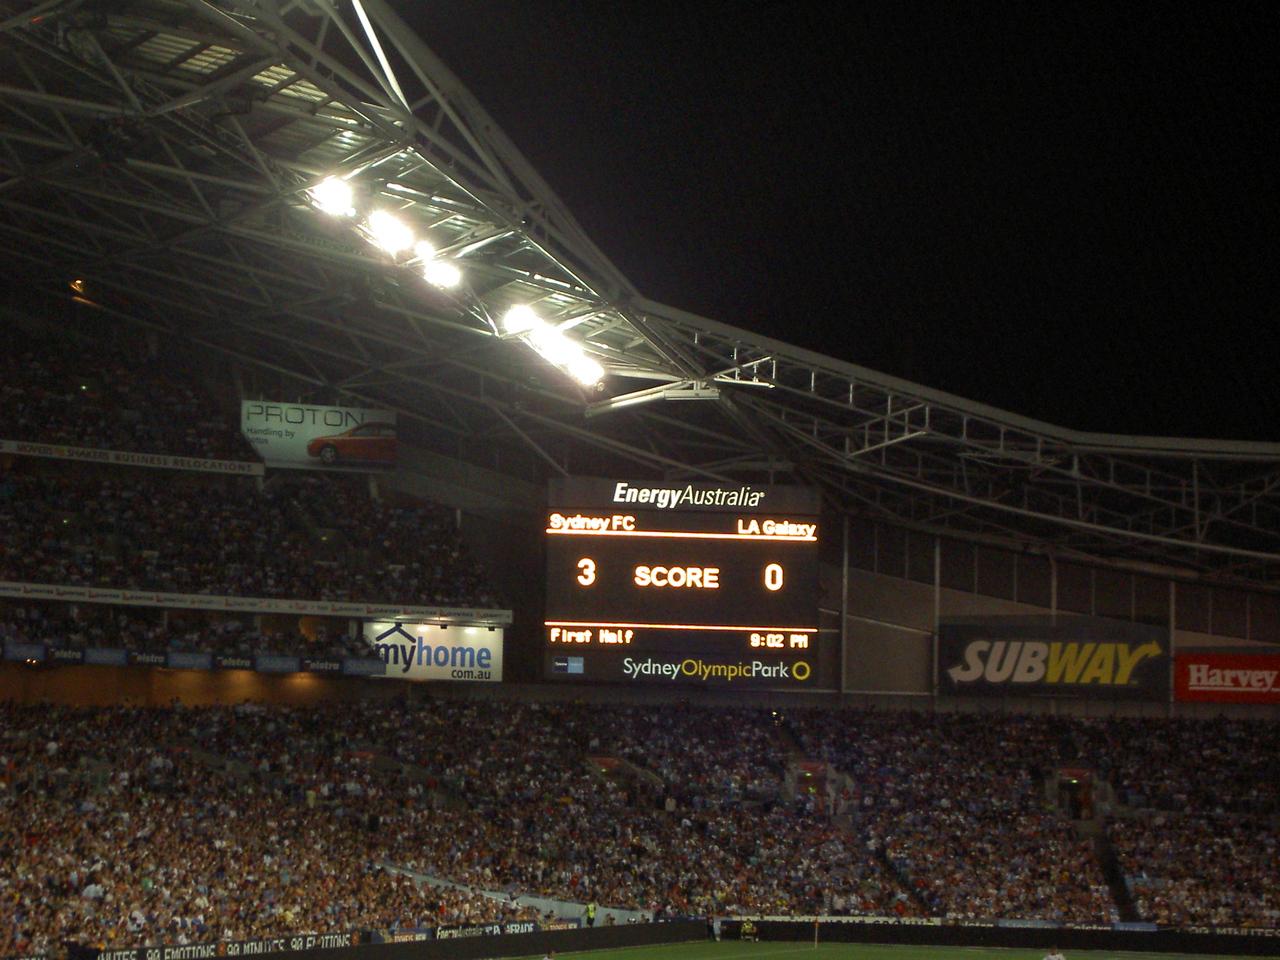 Sydney FC don't see that kinda score often, but then LA Galaxy are crap.